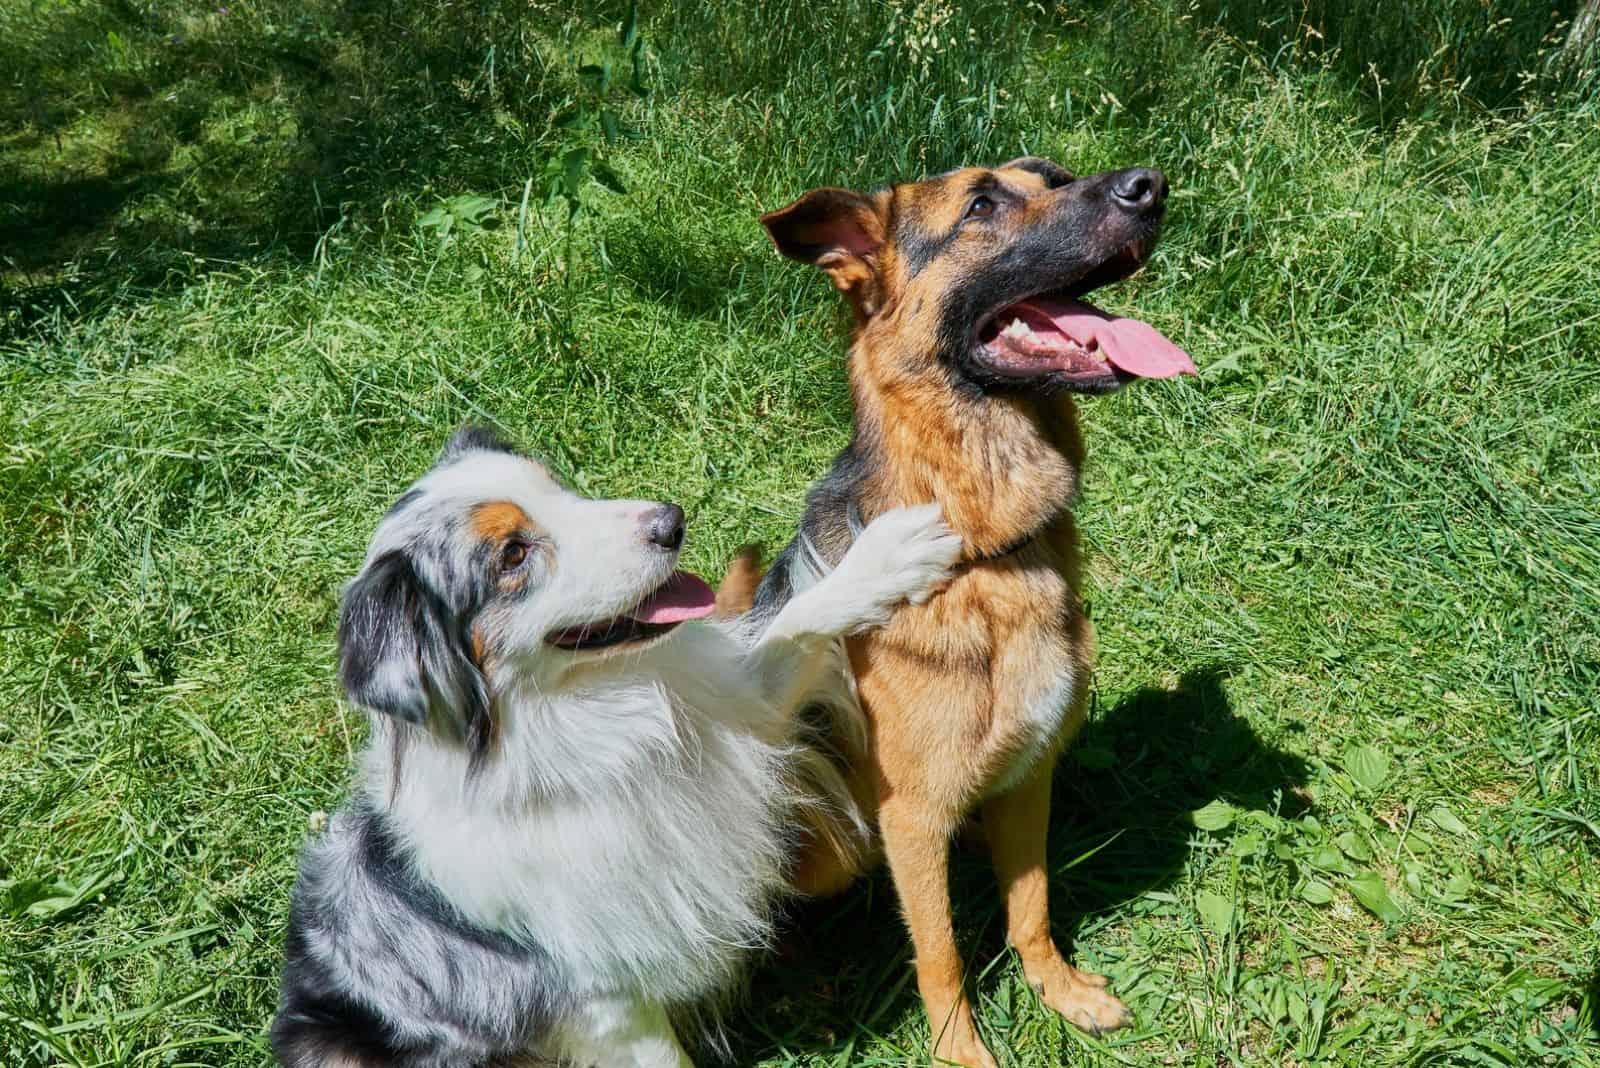 Australian Shepherd and German Shepherd sit on green grass. Australian Shepherd put his paw on a German Shepherd